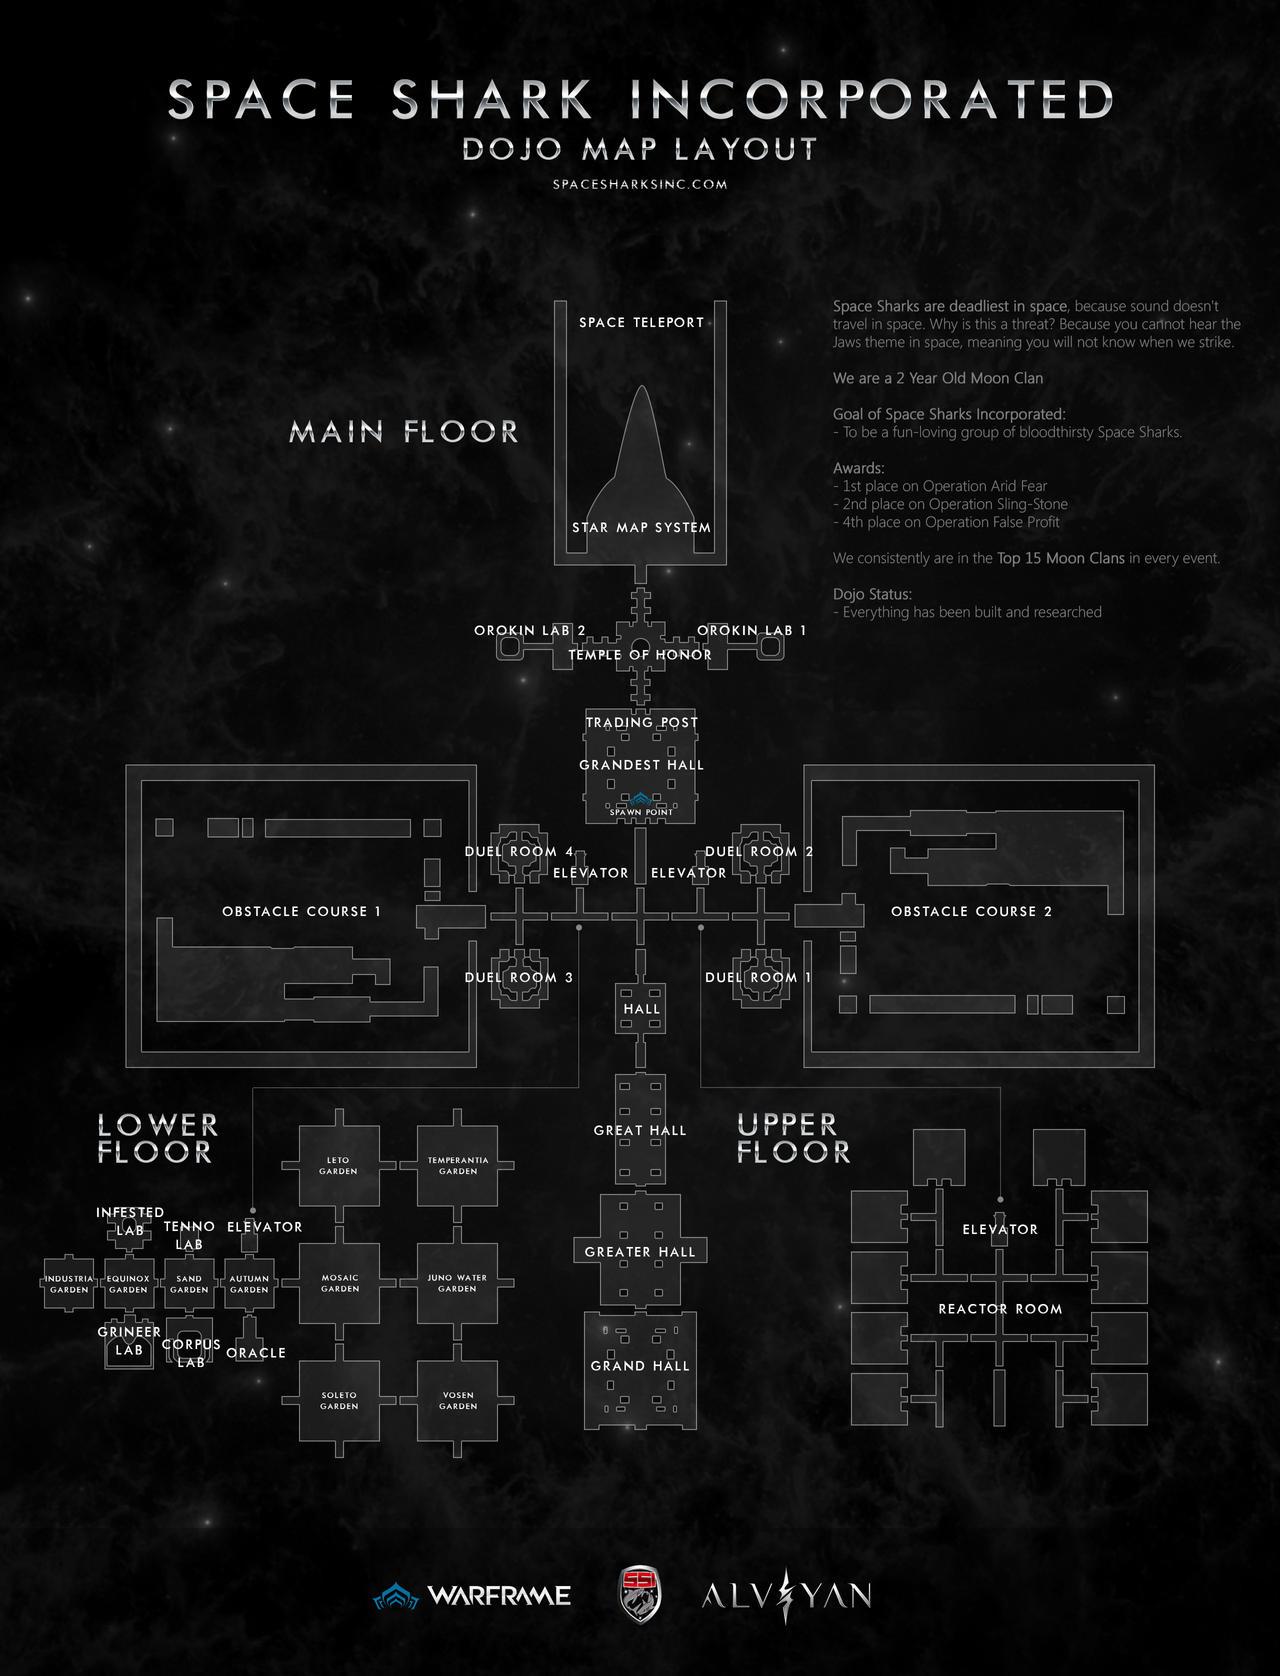 ... architectural design design dojo incorporated map original raden shark